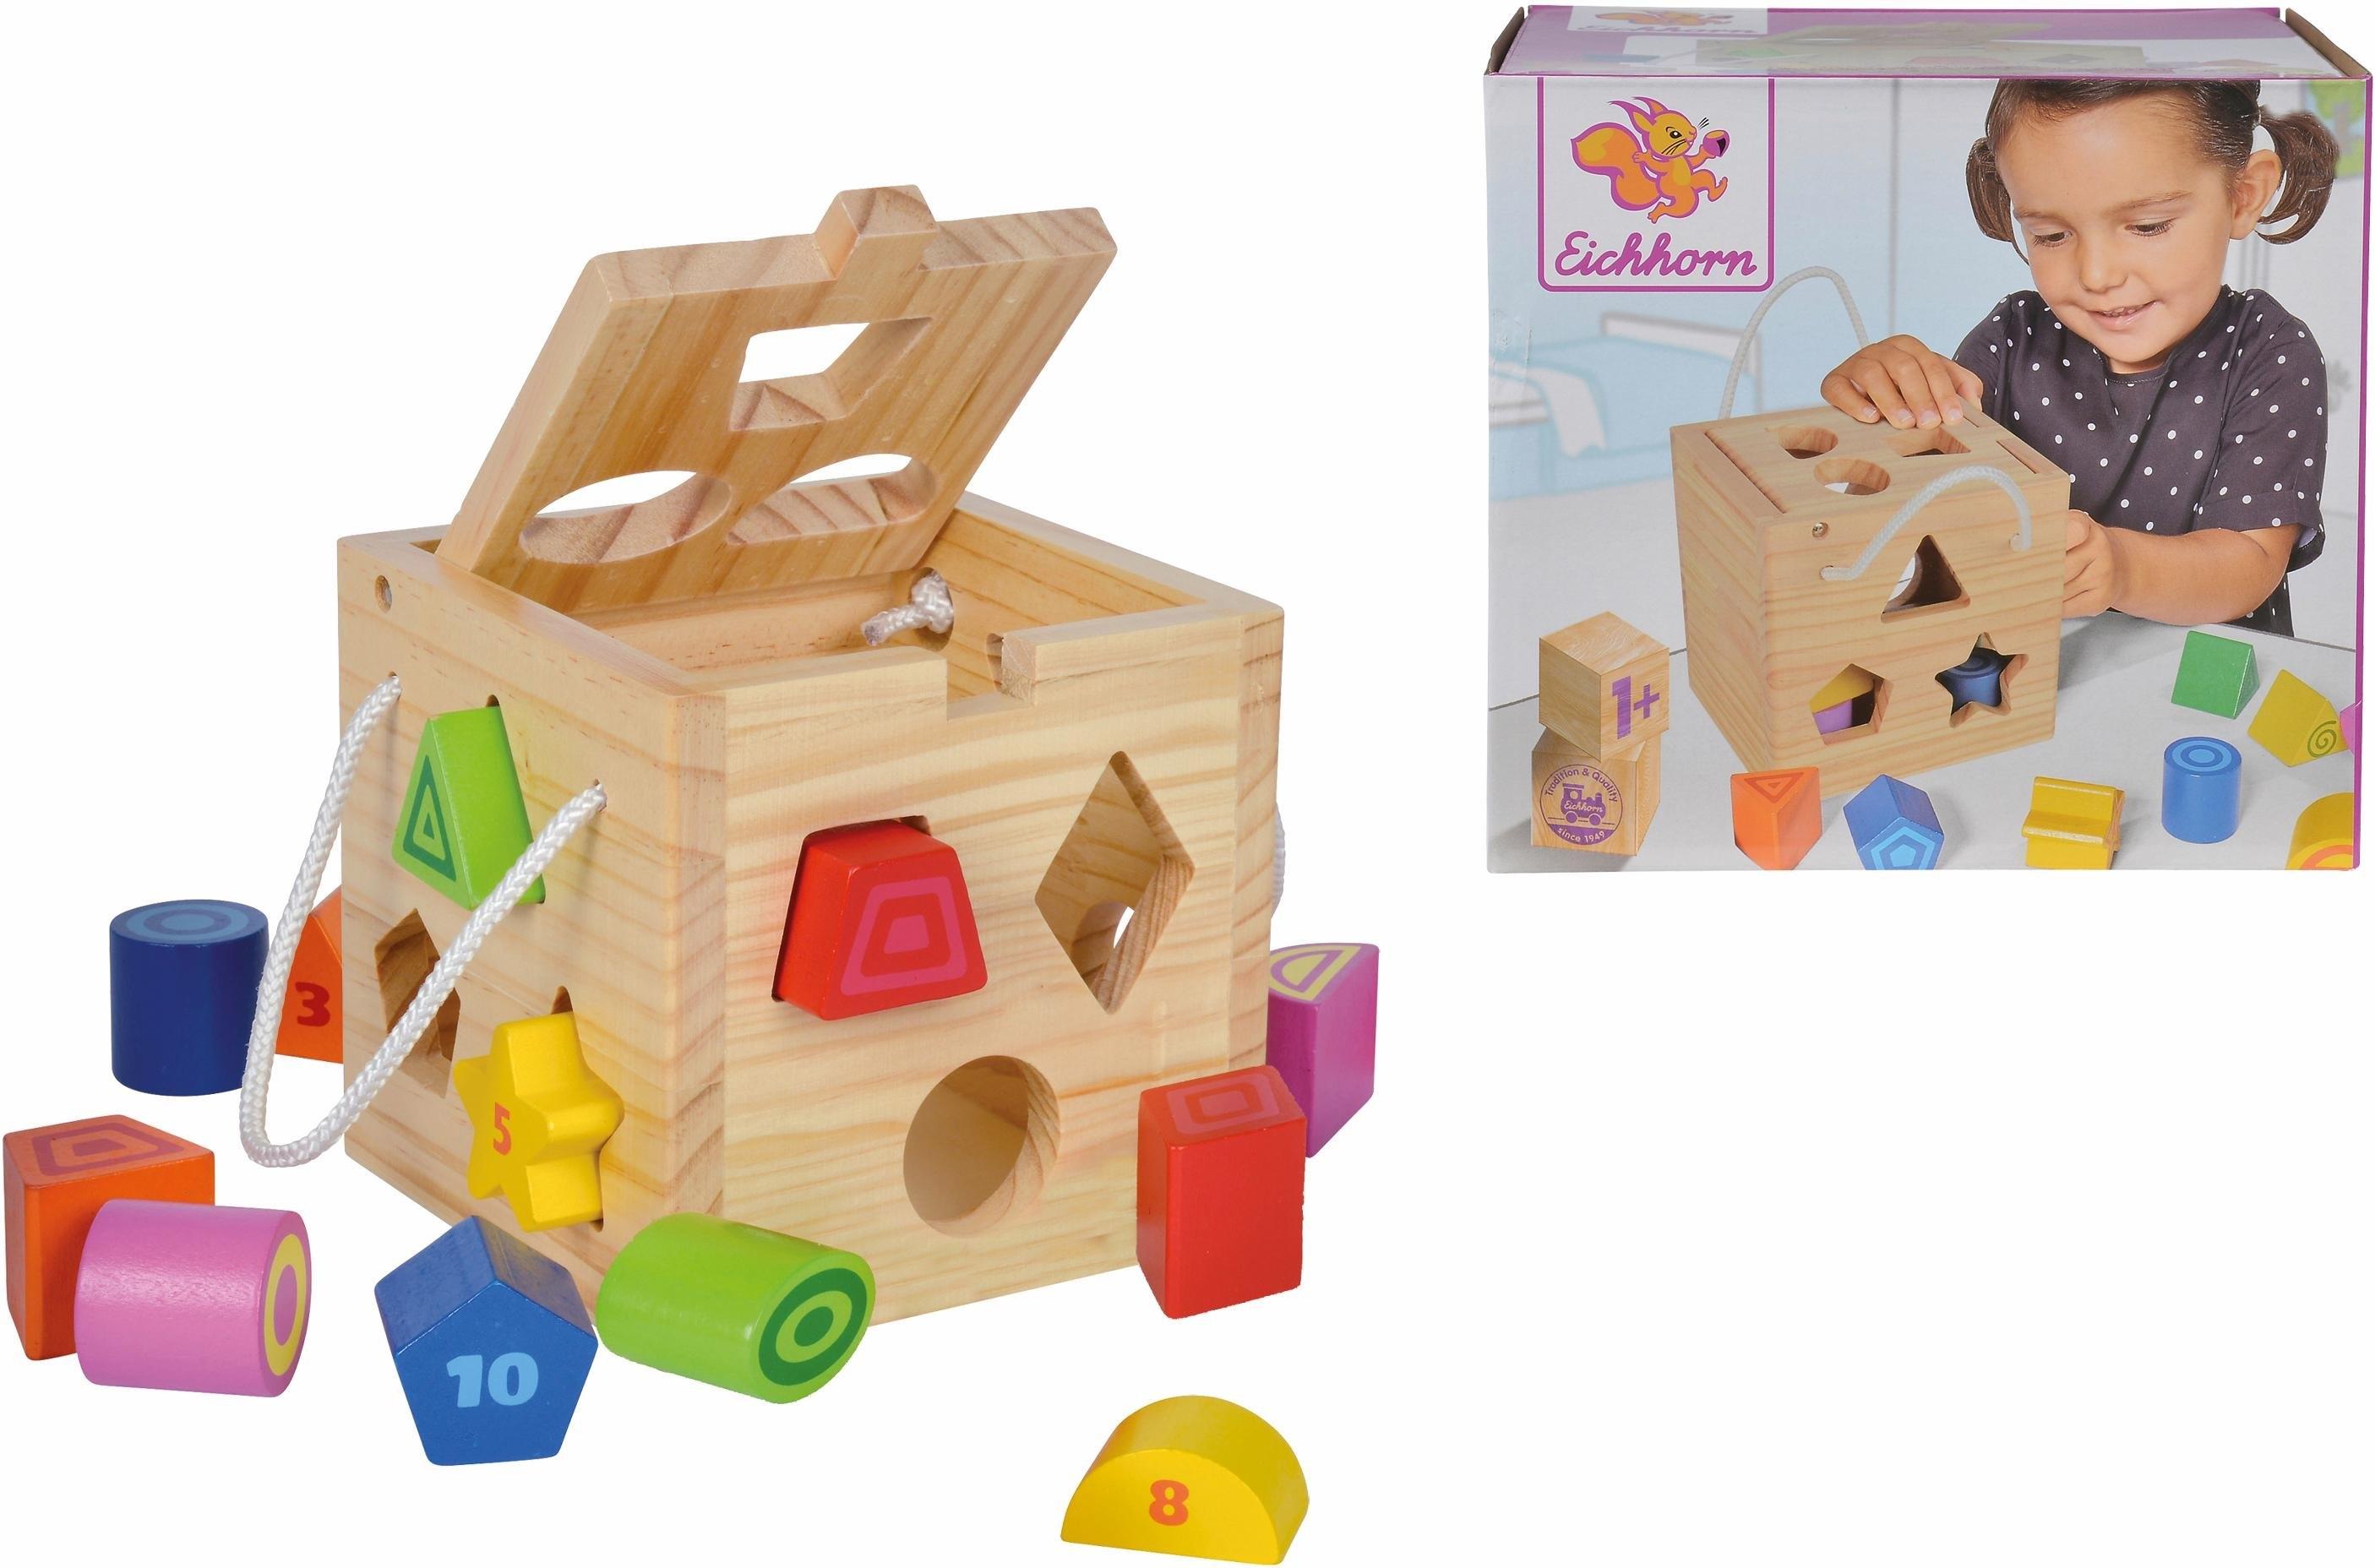 Eichhorn vormenspel houten online kopen op otto.nl